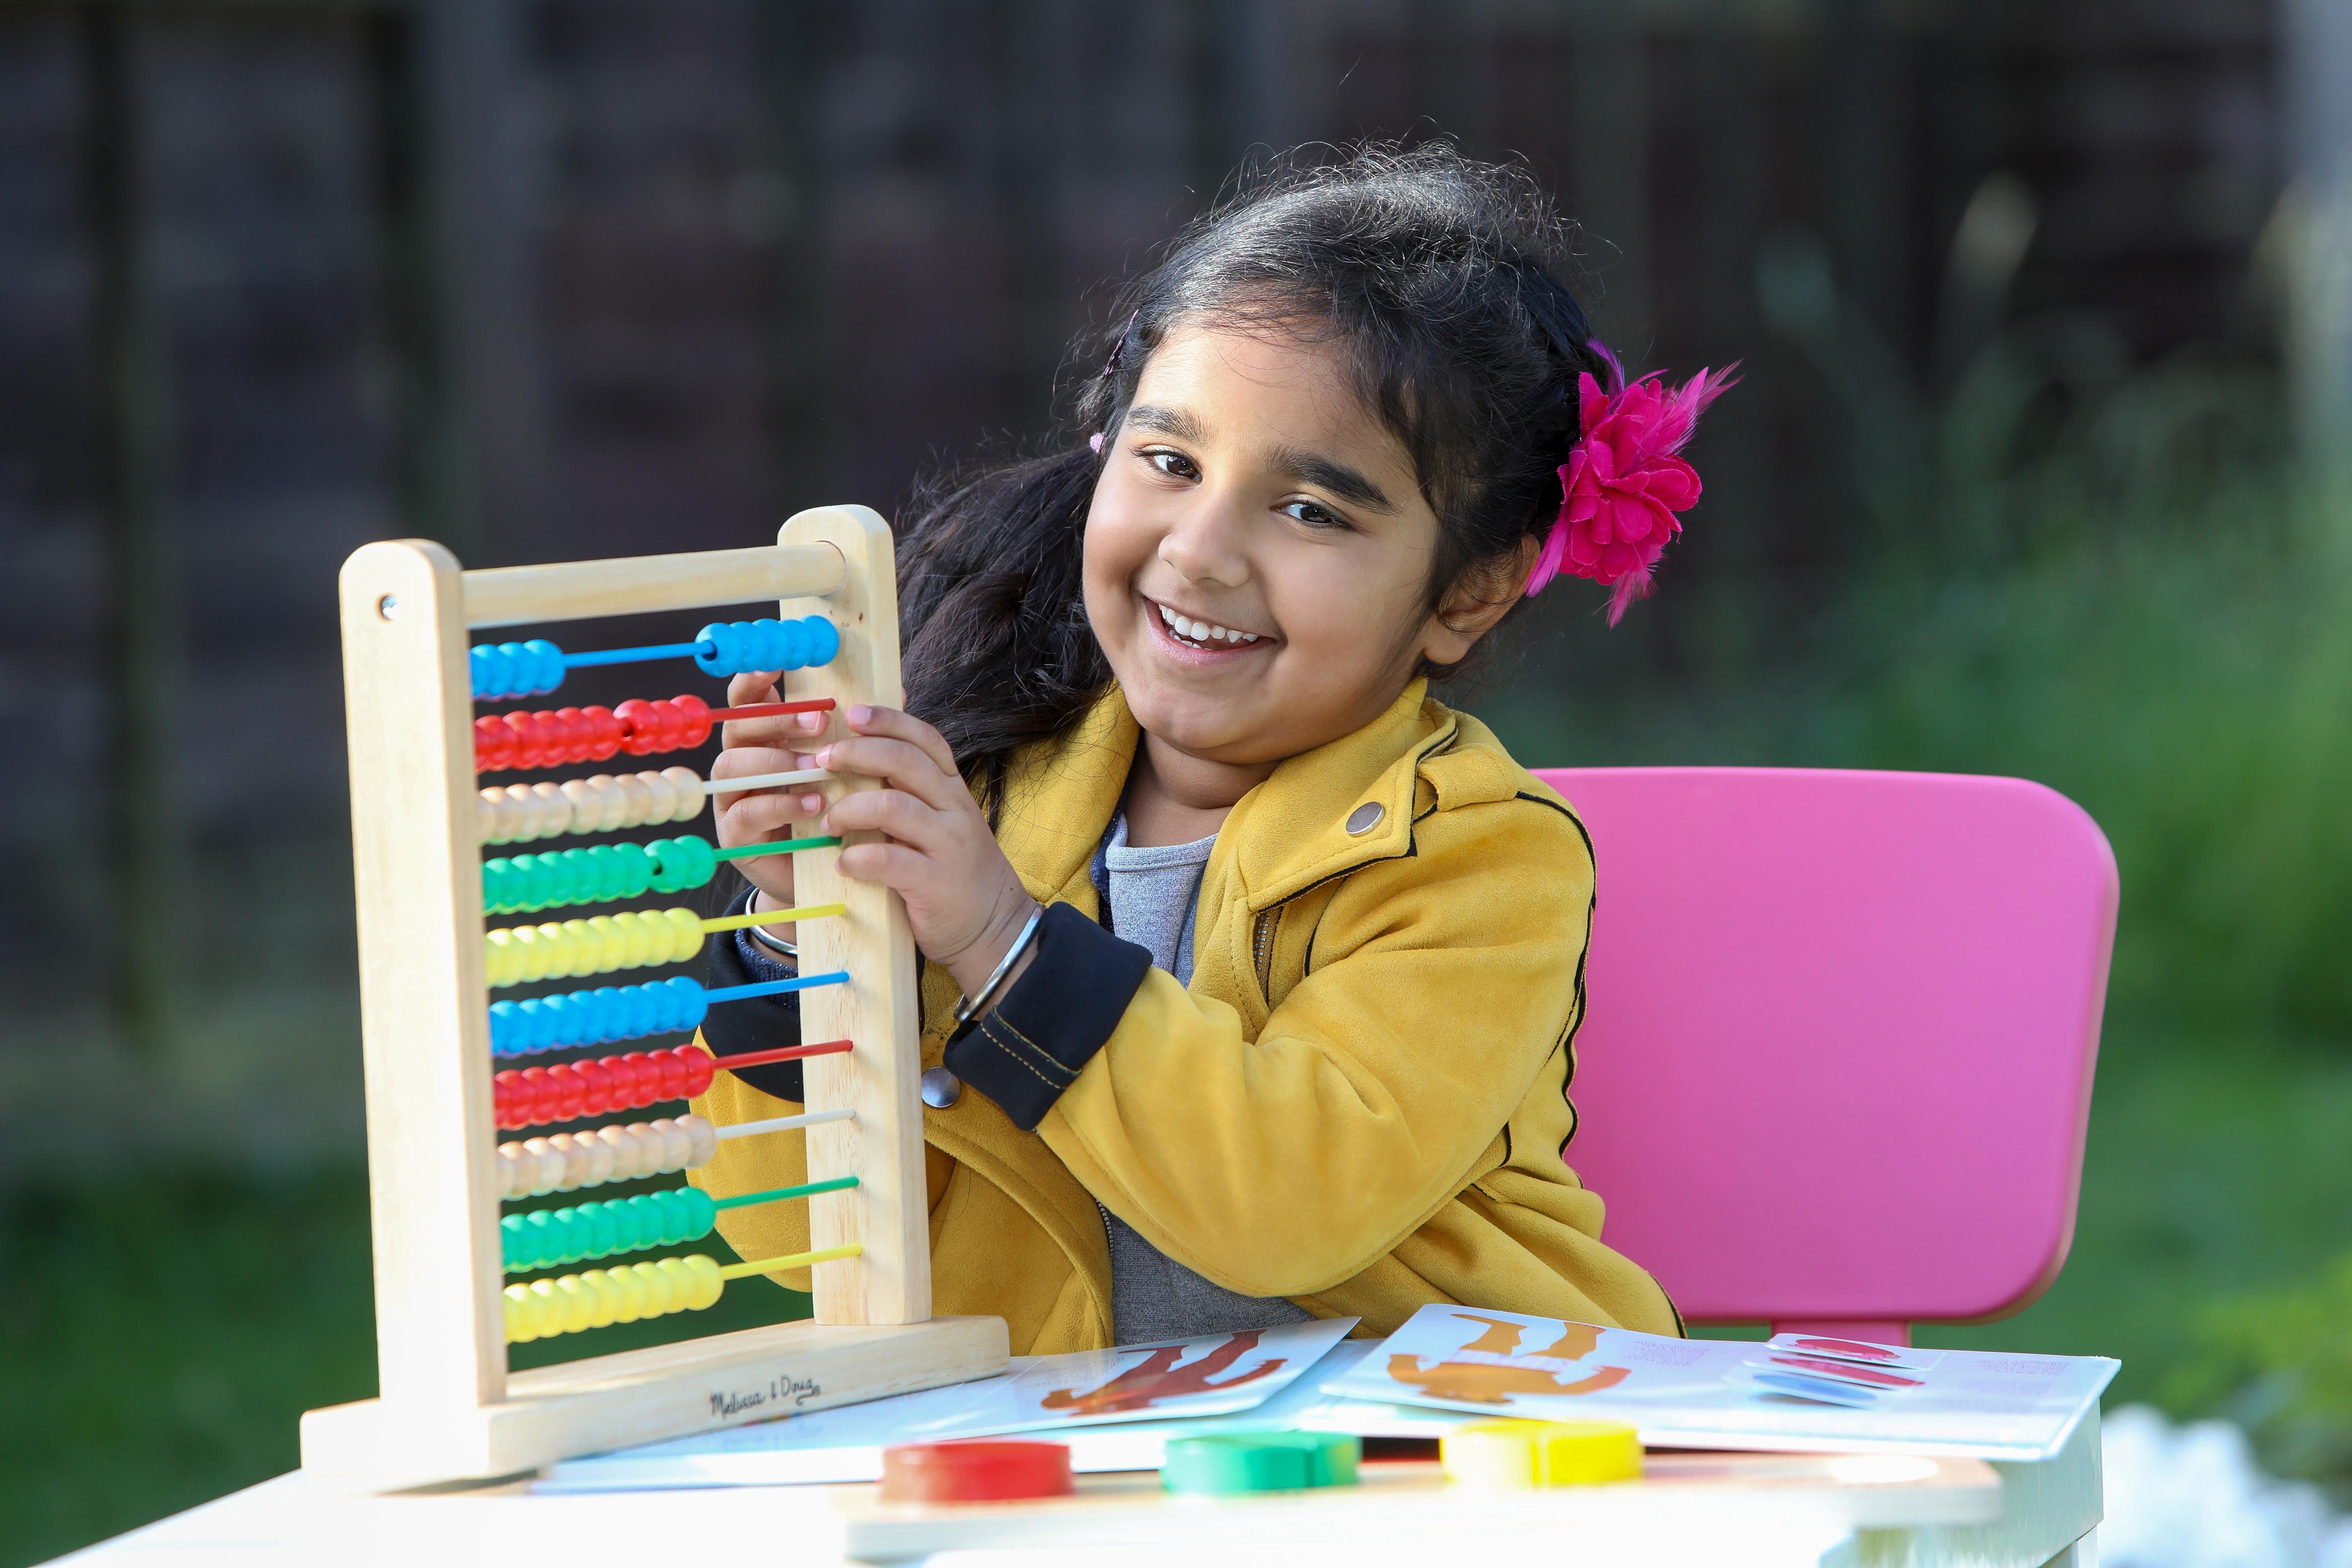 IQ трехлетней девочки оказался почти как у Эйнштейна